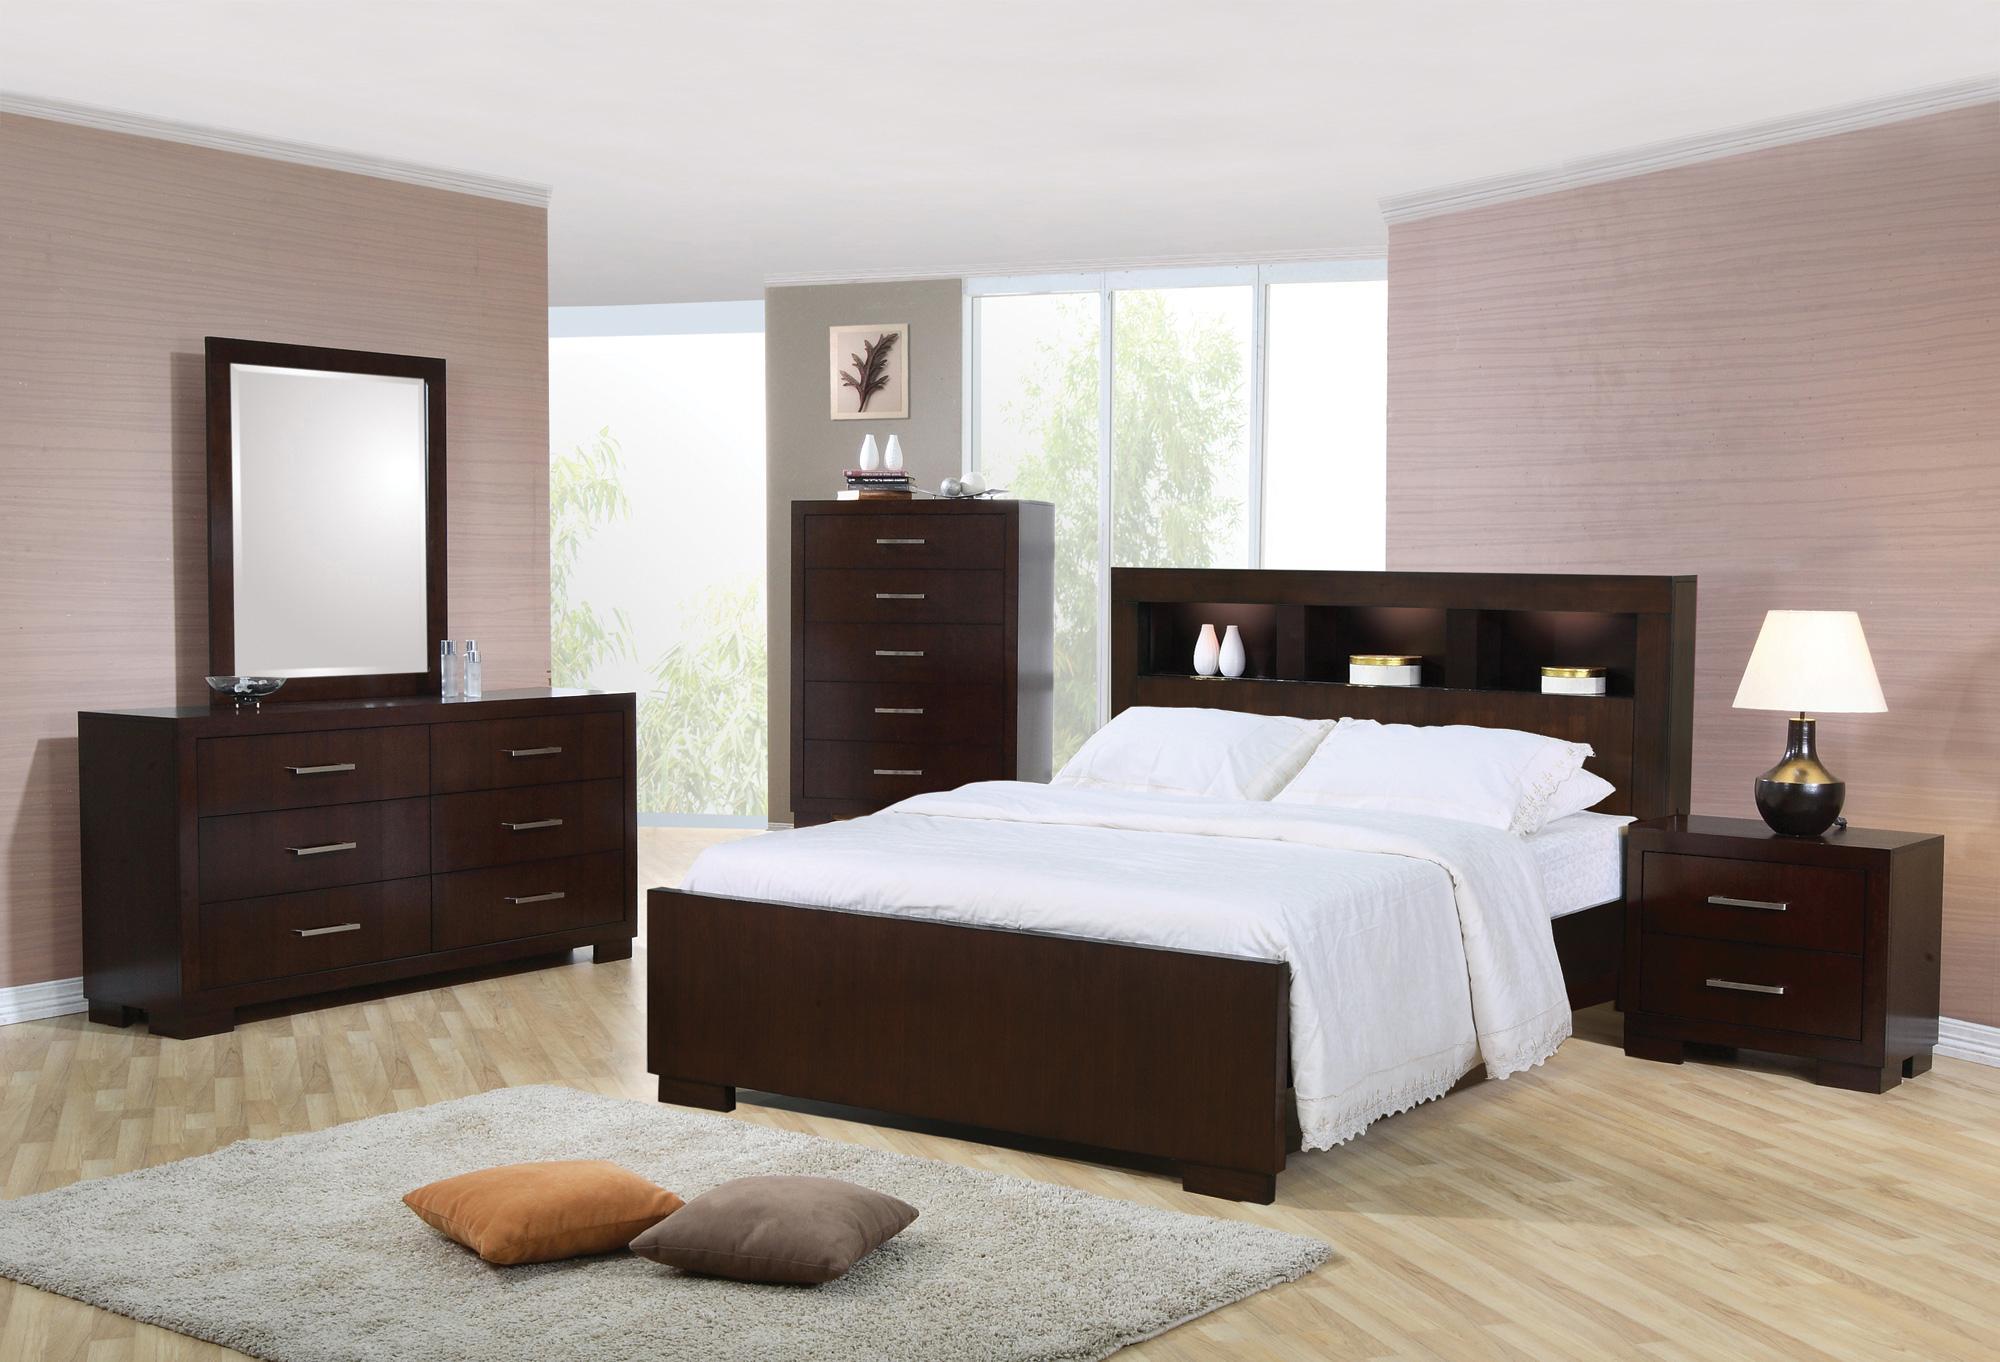 coaster jessica 2 drawer nightstand - coaster fine furniture Desk and Nightstand Set